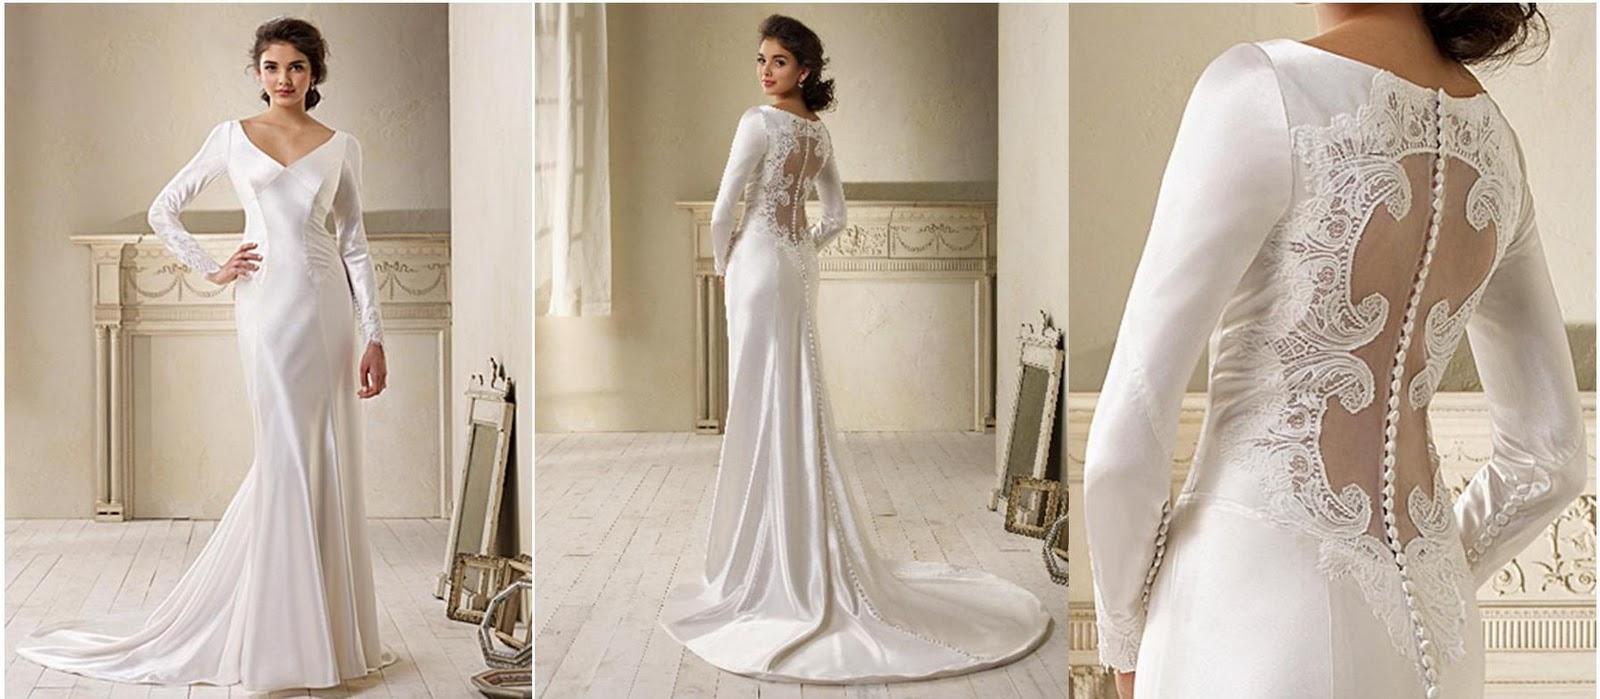 Legal Me Yours Bella Swan S Wedding Dress